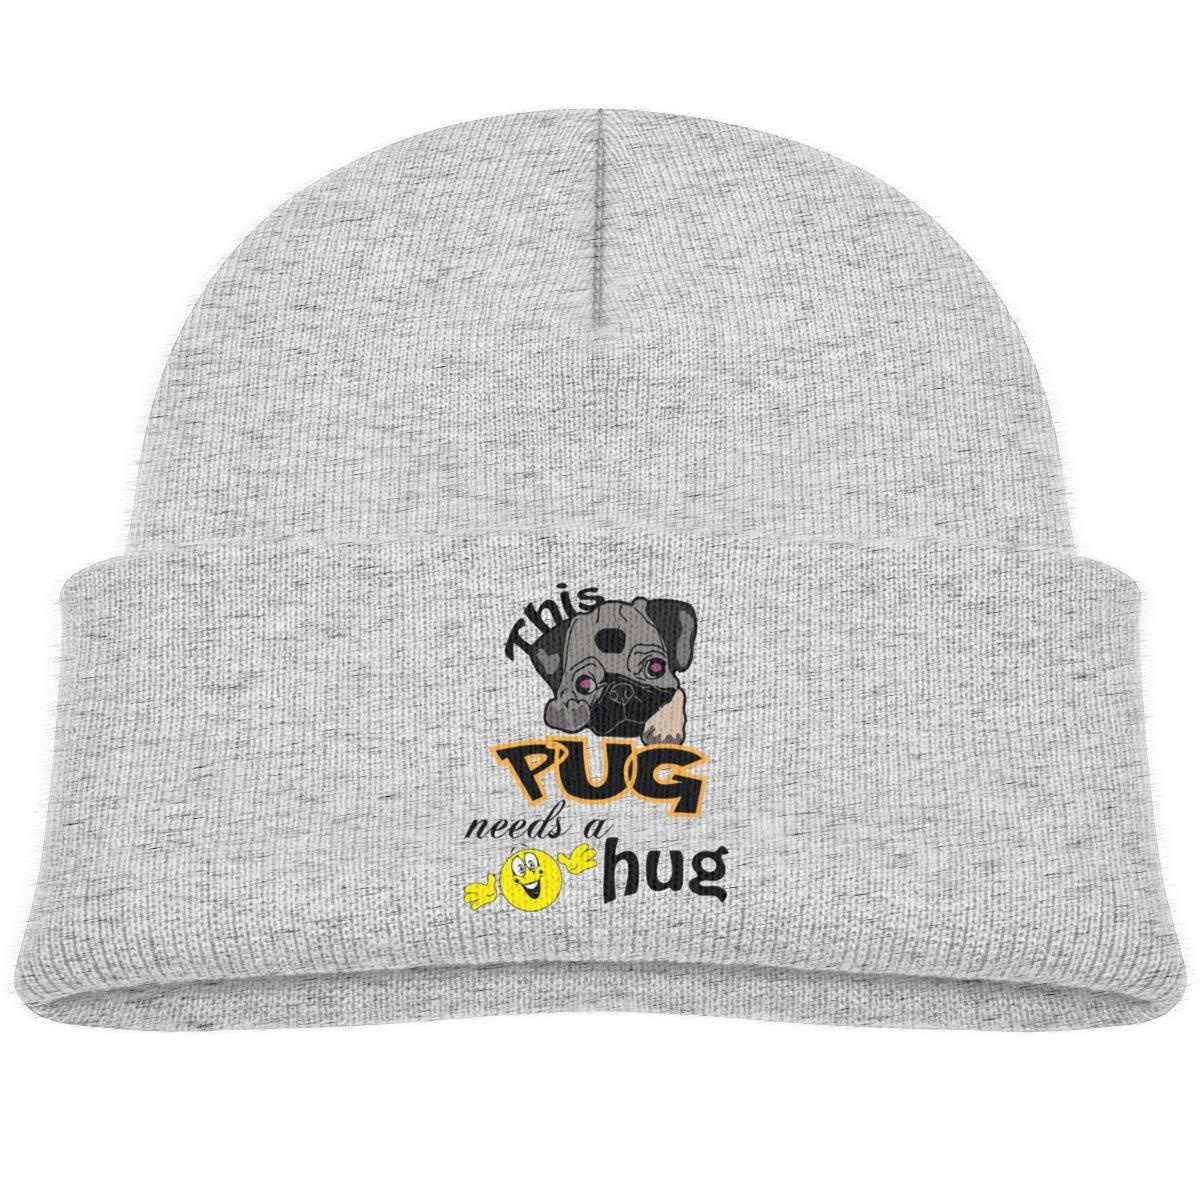 This Pug Needs A Hug Skull Caps Baby Girls